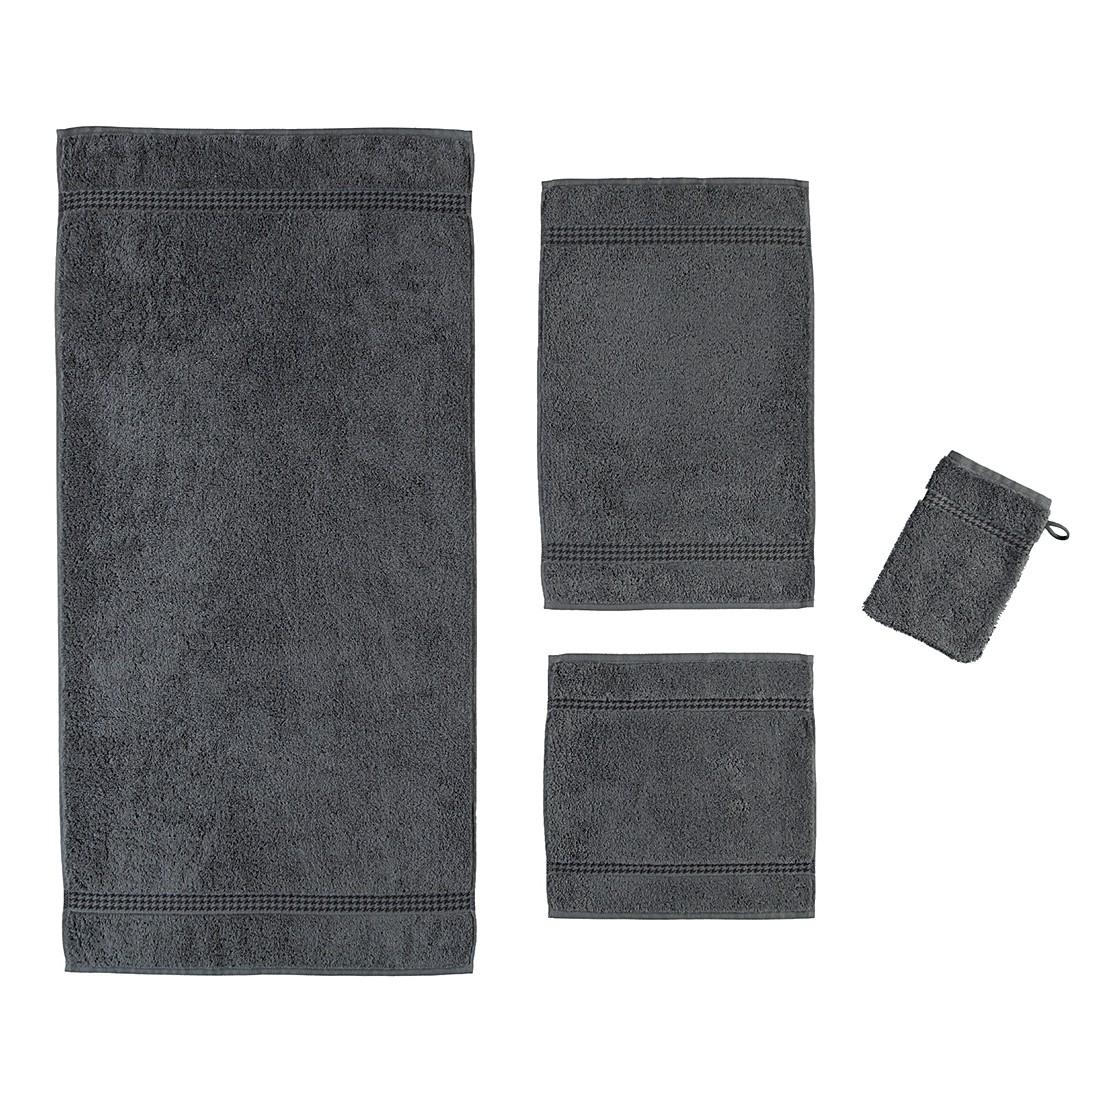 handt cher selection uni 4010 baumwolle anthrazit g stetuch 30x50 cm caw g nstig. Black Bedroom Furniture Sets. Home Design Ideas